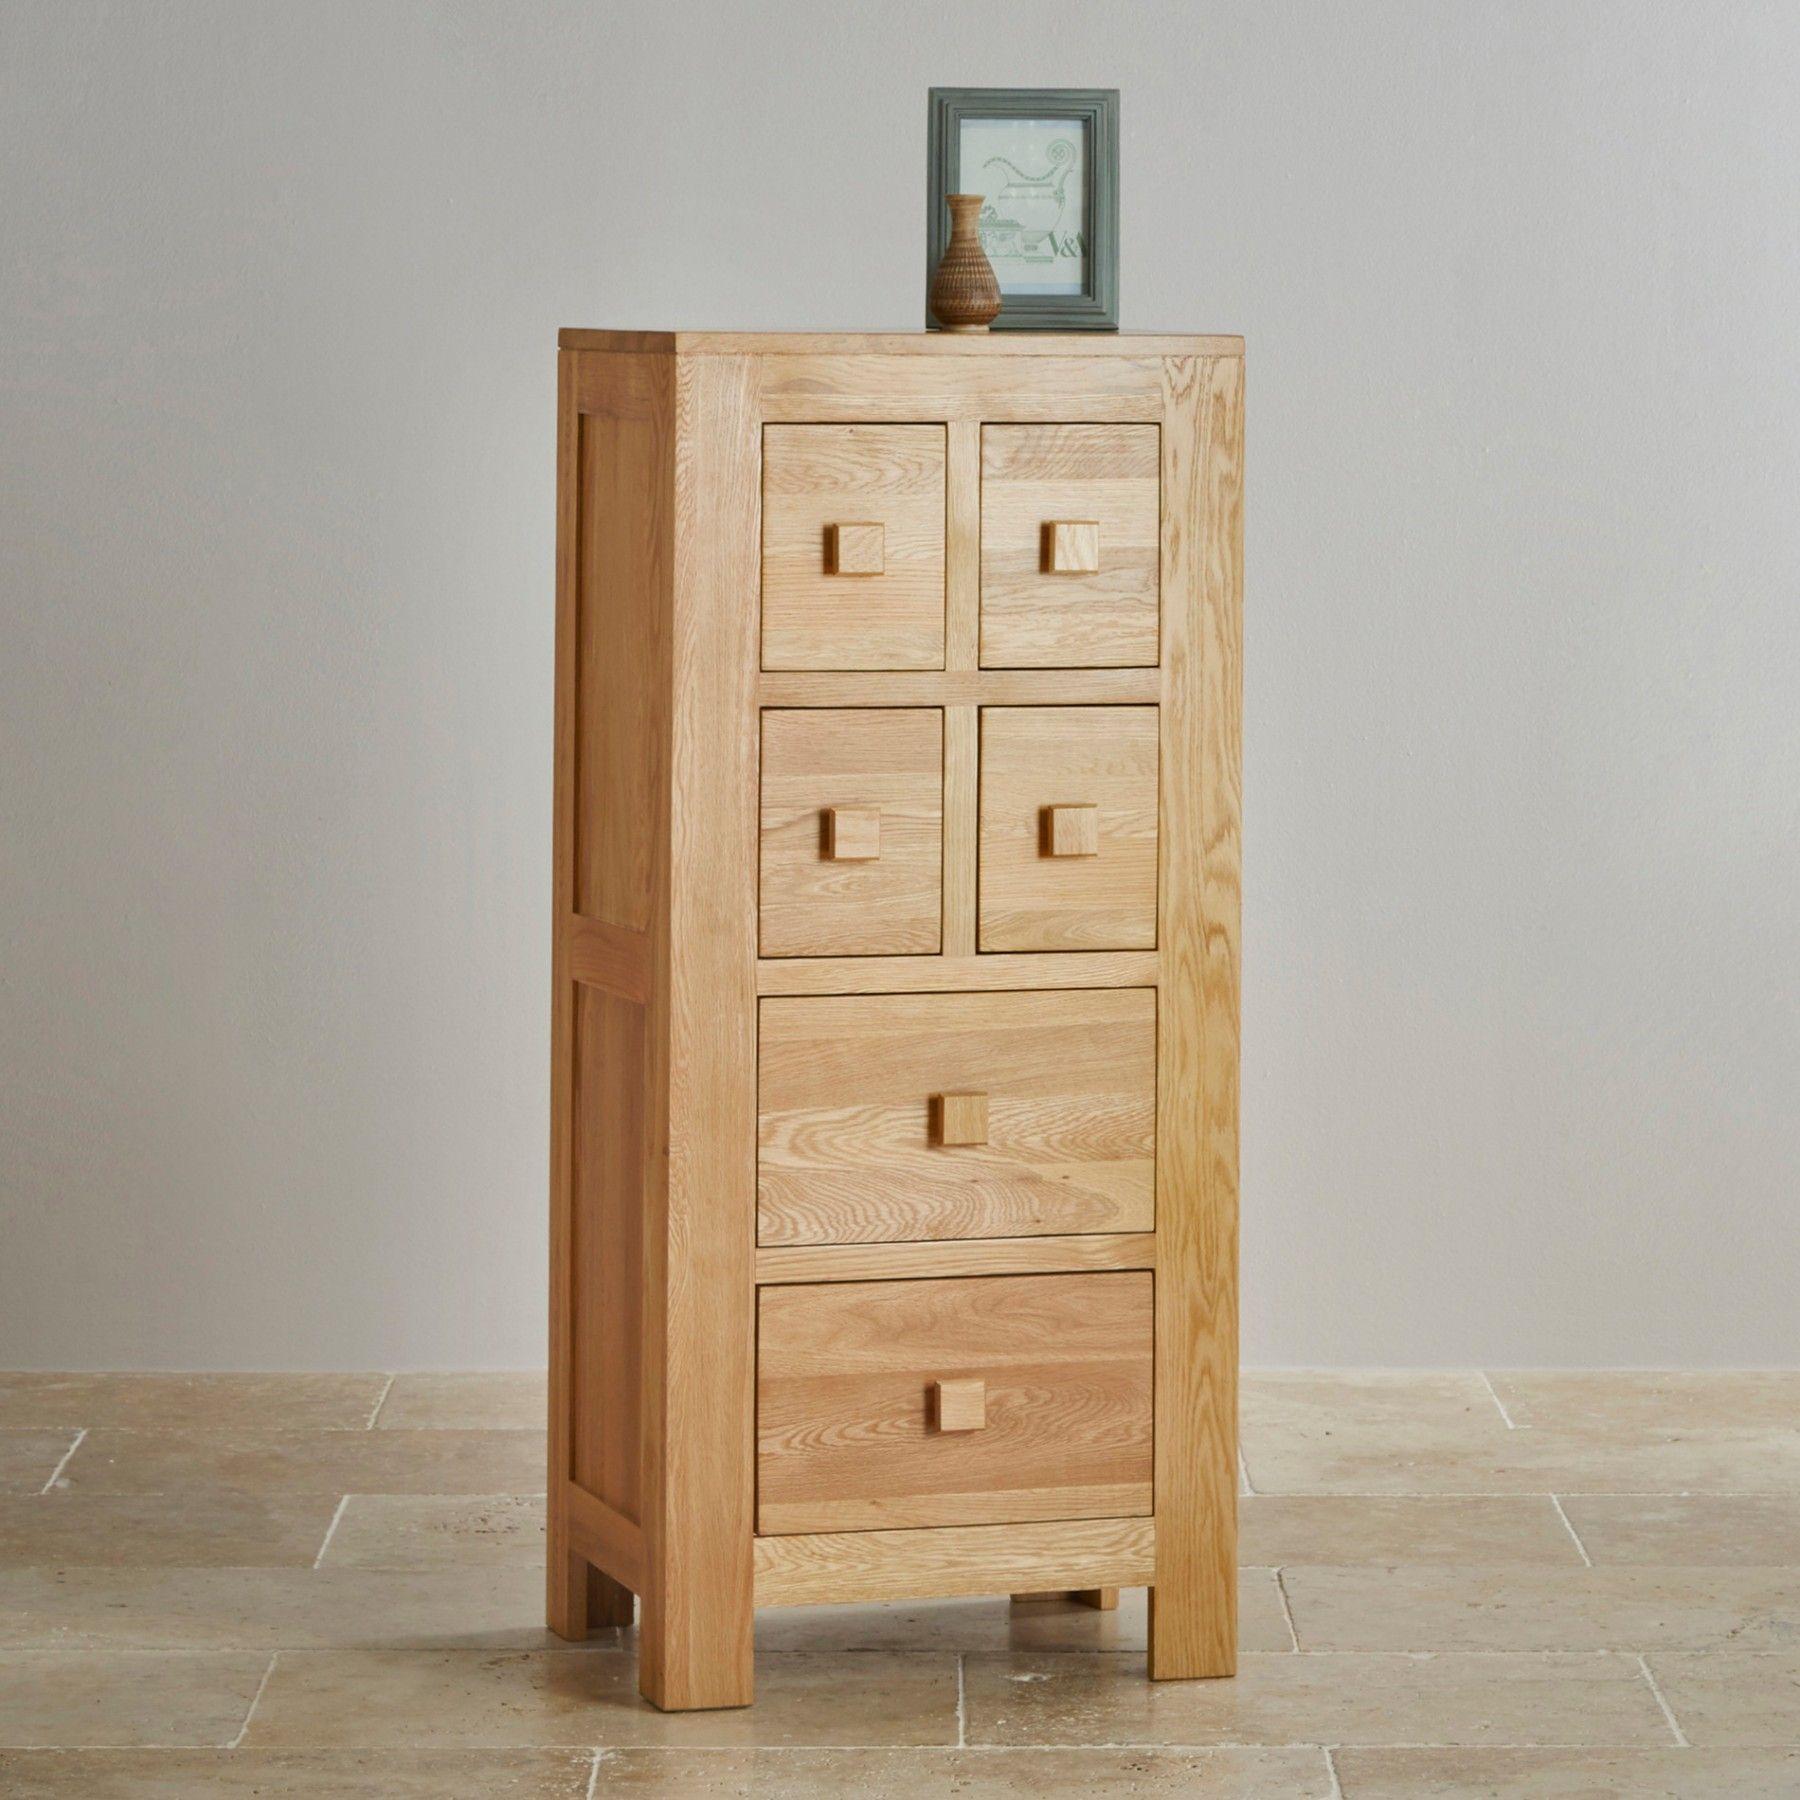 furniture drawer drawers six daze mayan p asp storage present walnut dvd gifts chest cd